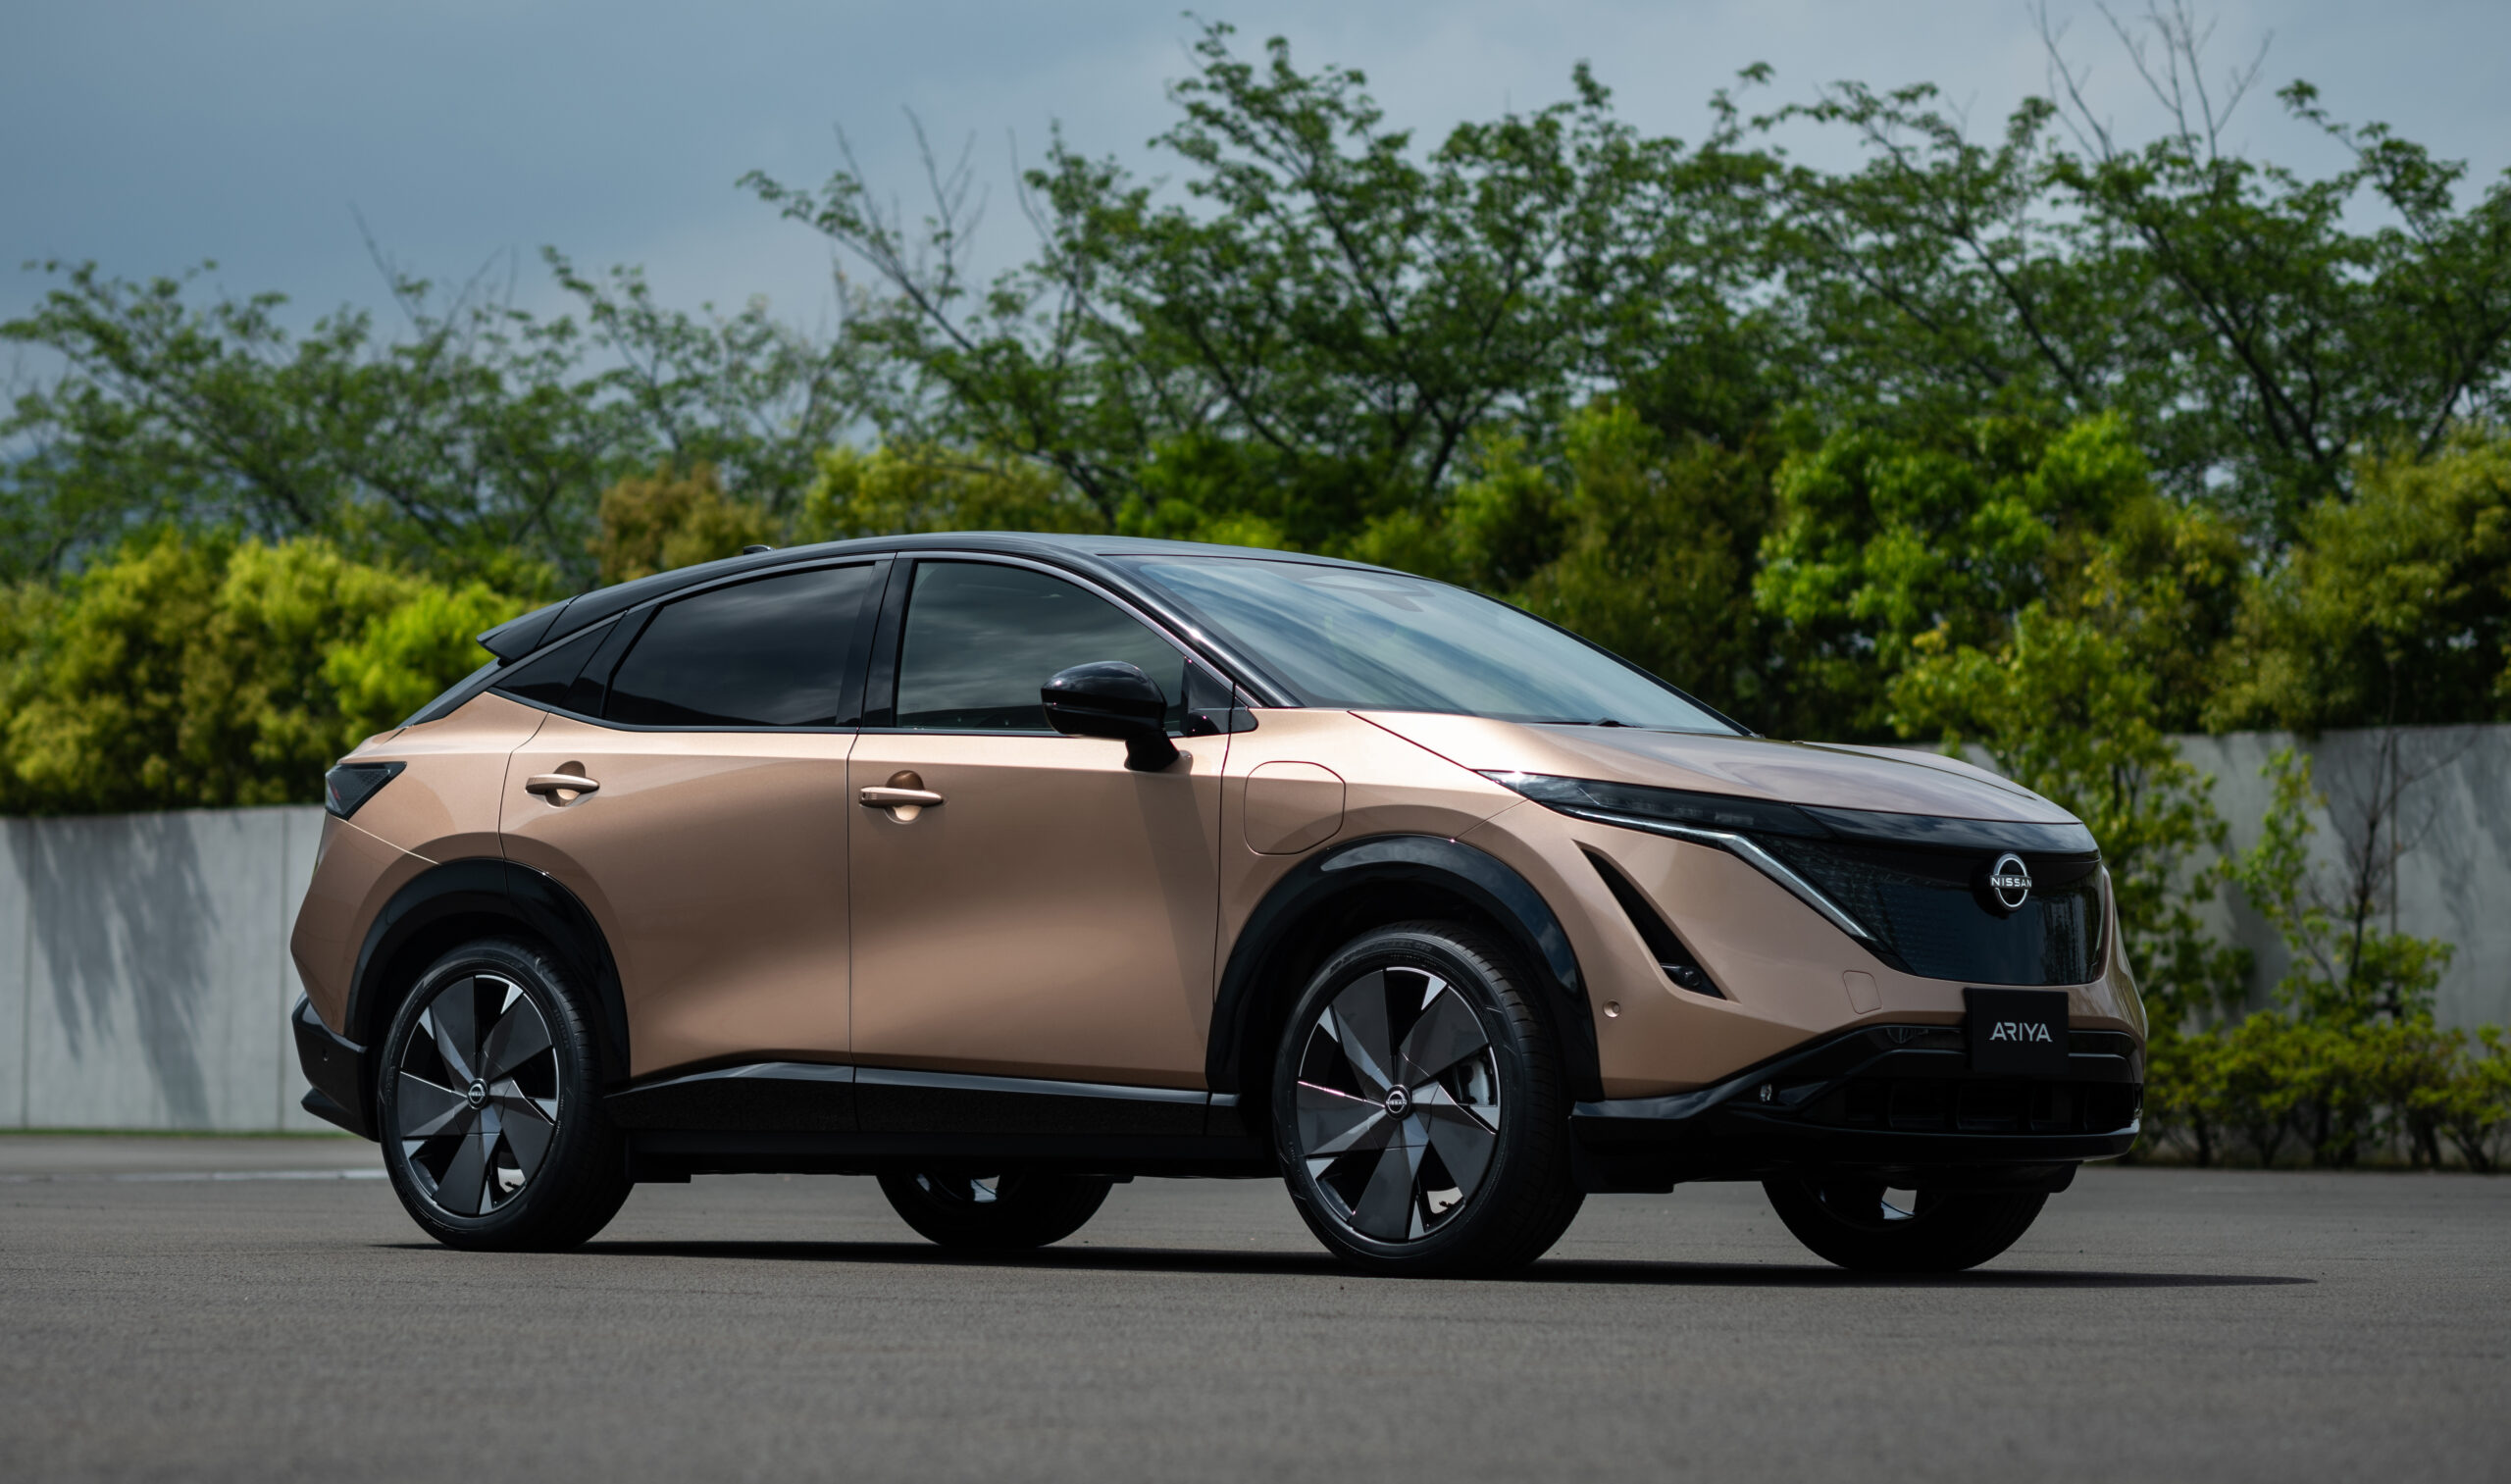 Nissan Ariya in profile.